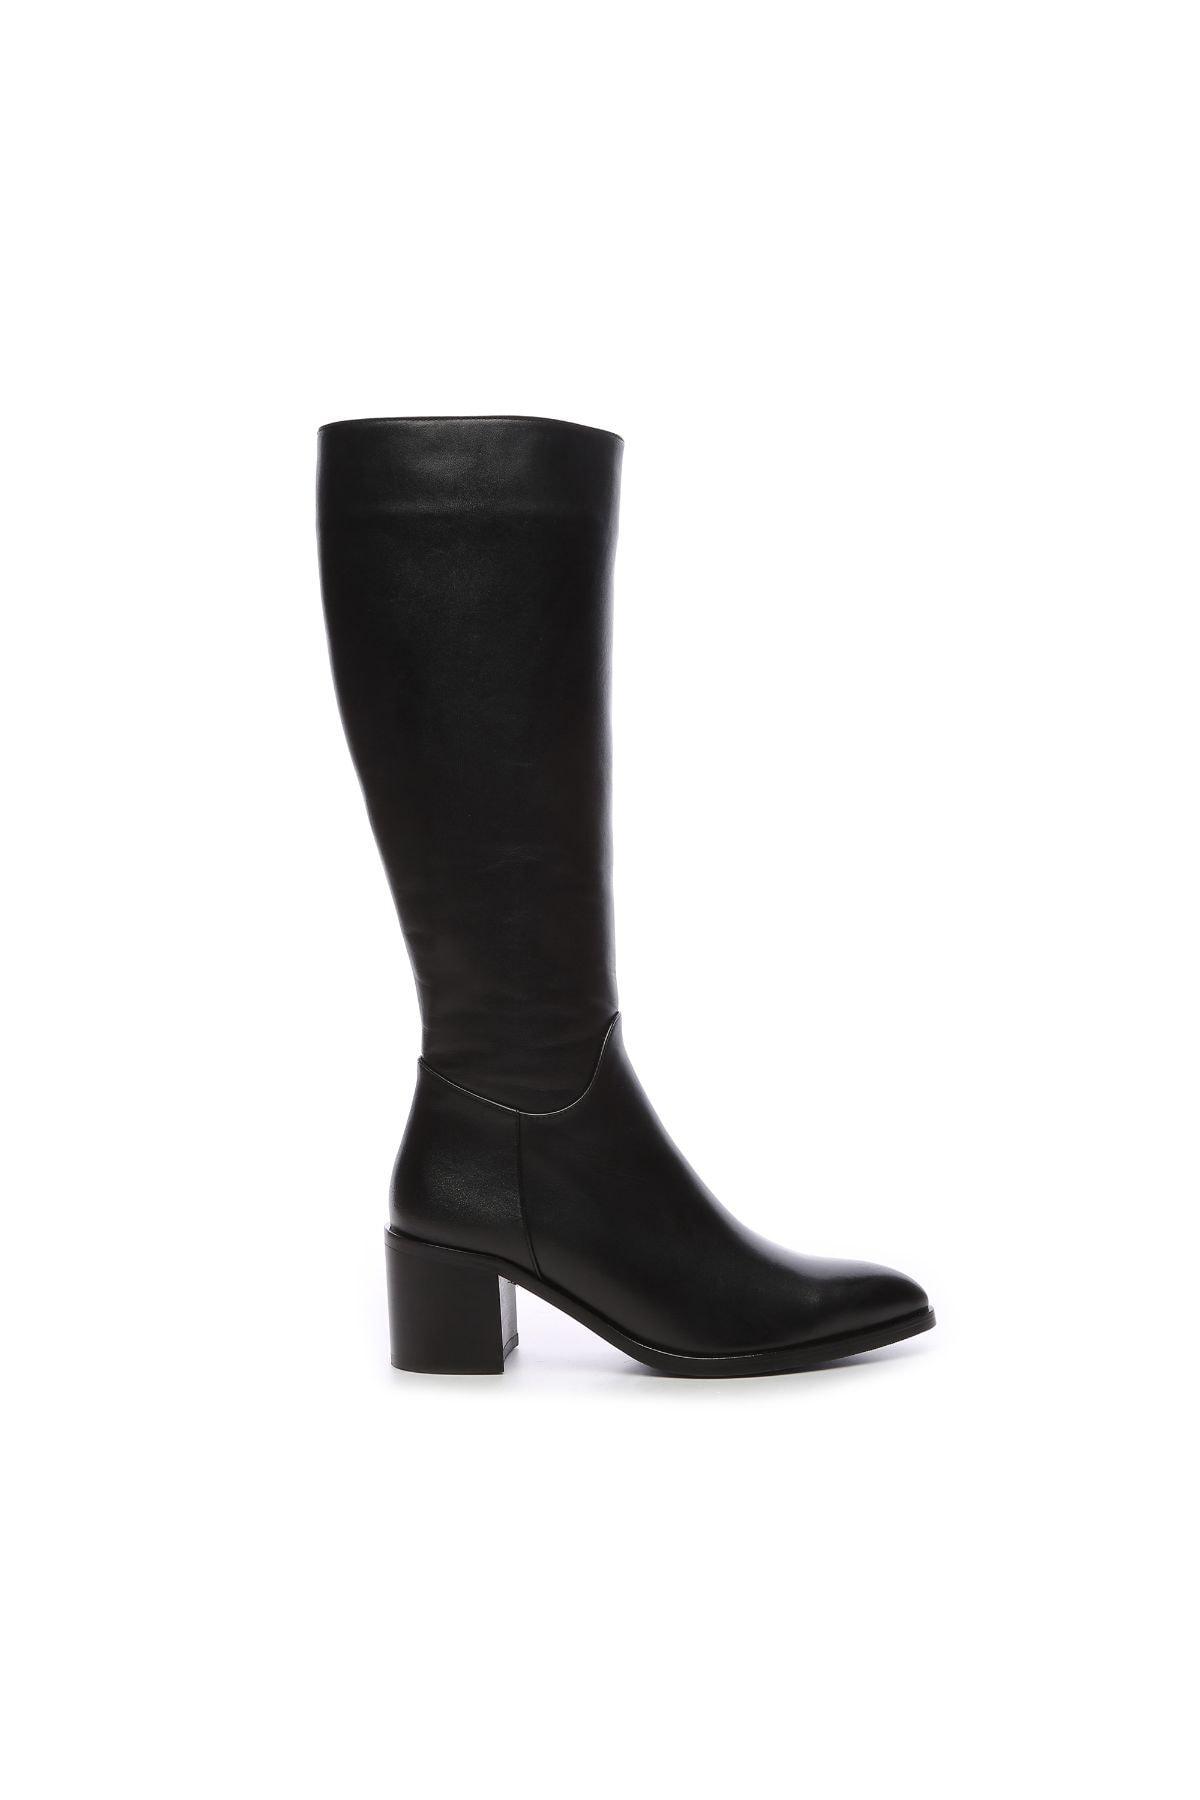 KEMAL TANCA Kadın Derı Çizme Çizme 51 350C BN CZM SK20 1